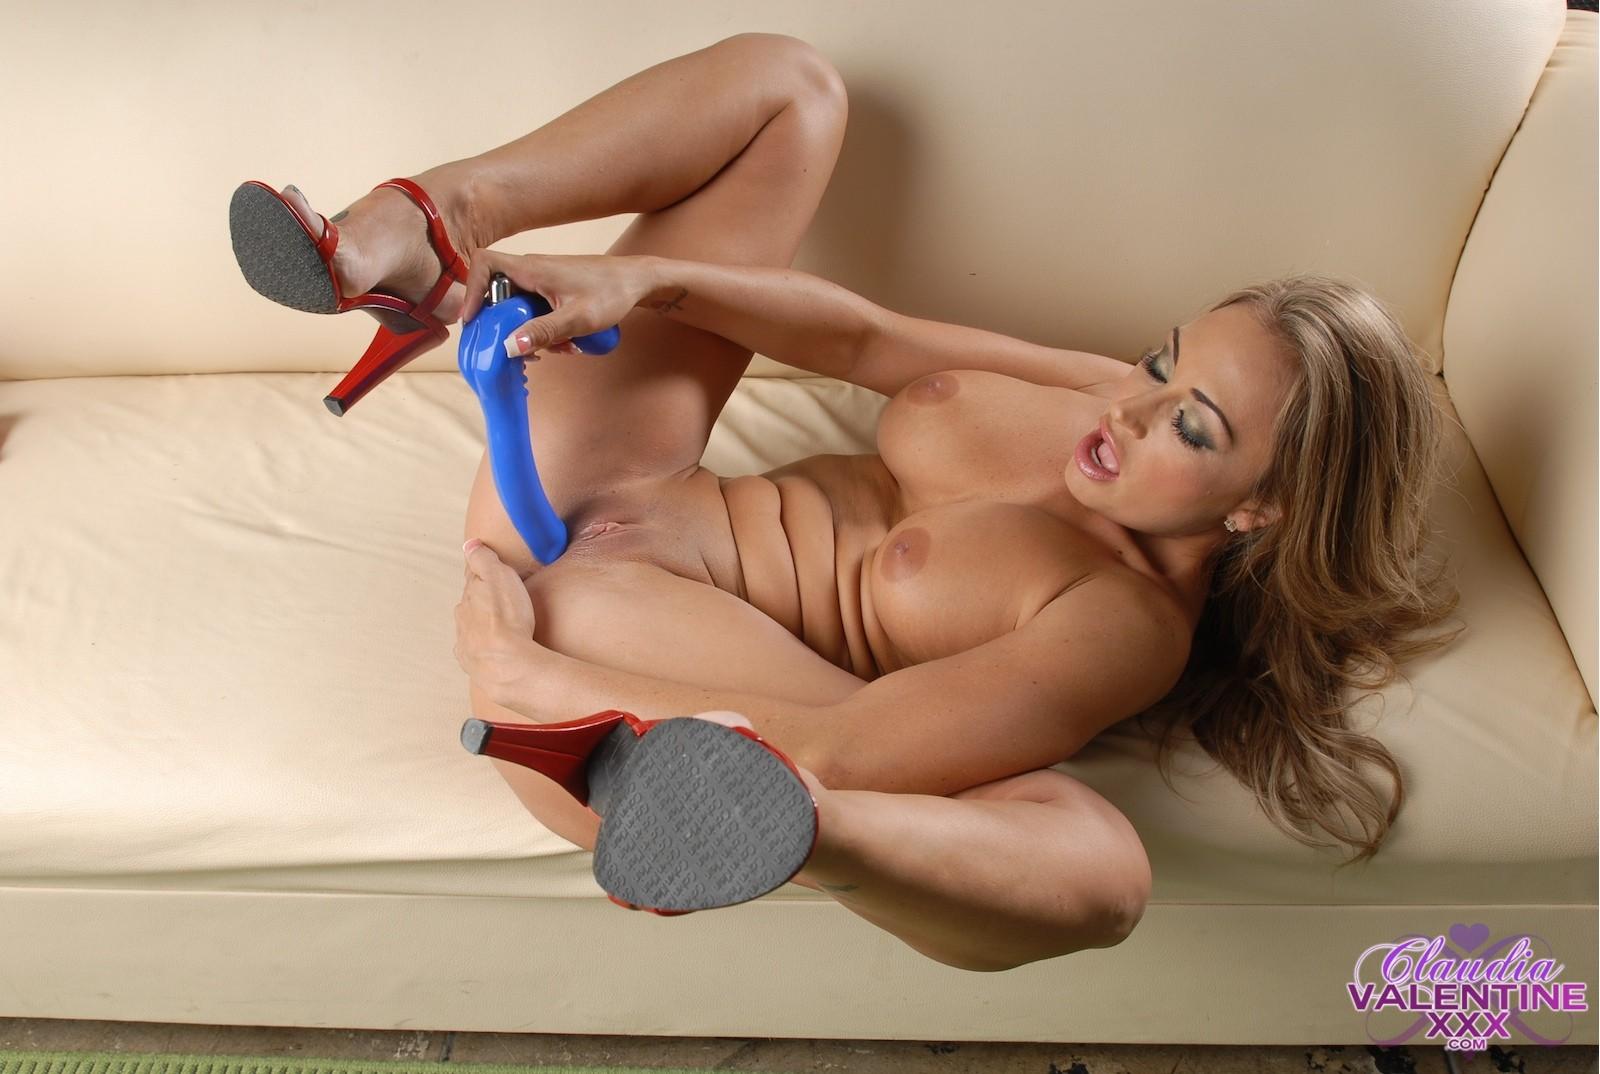 Claudia Valentine - Галерея 3366220